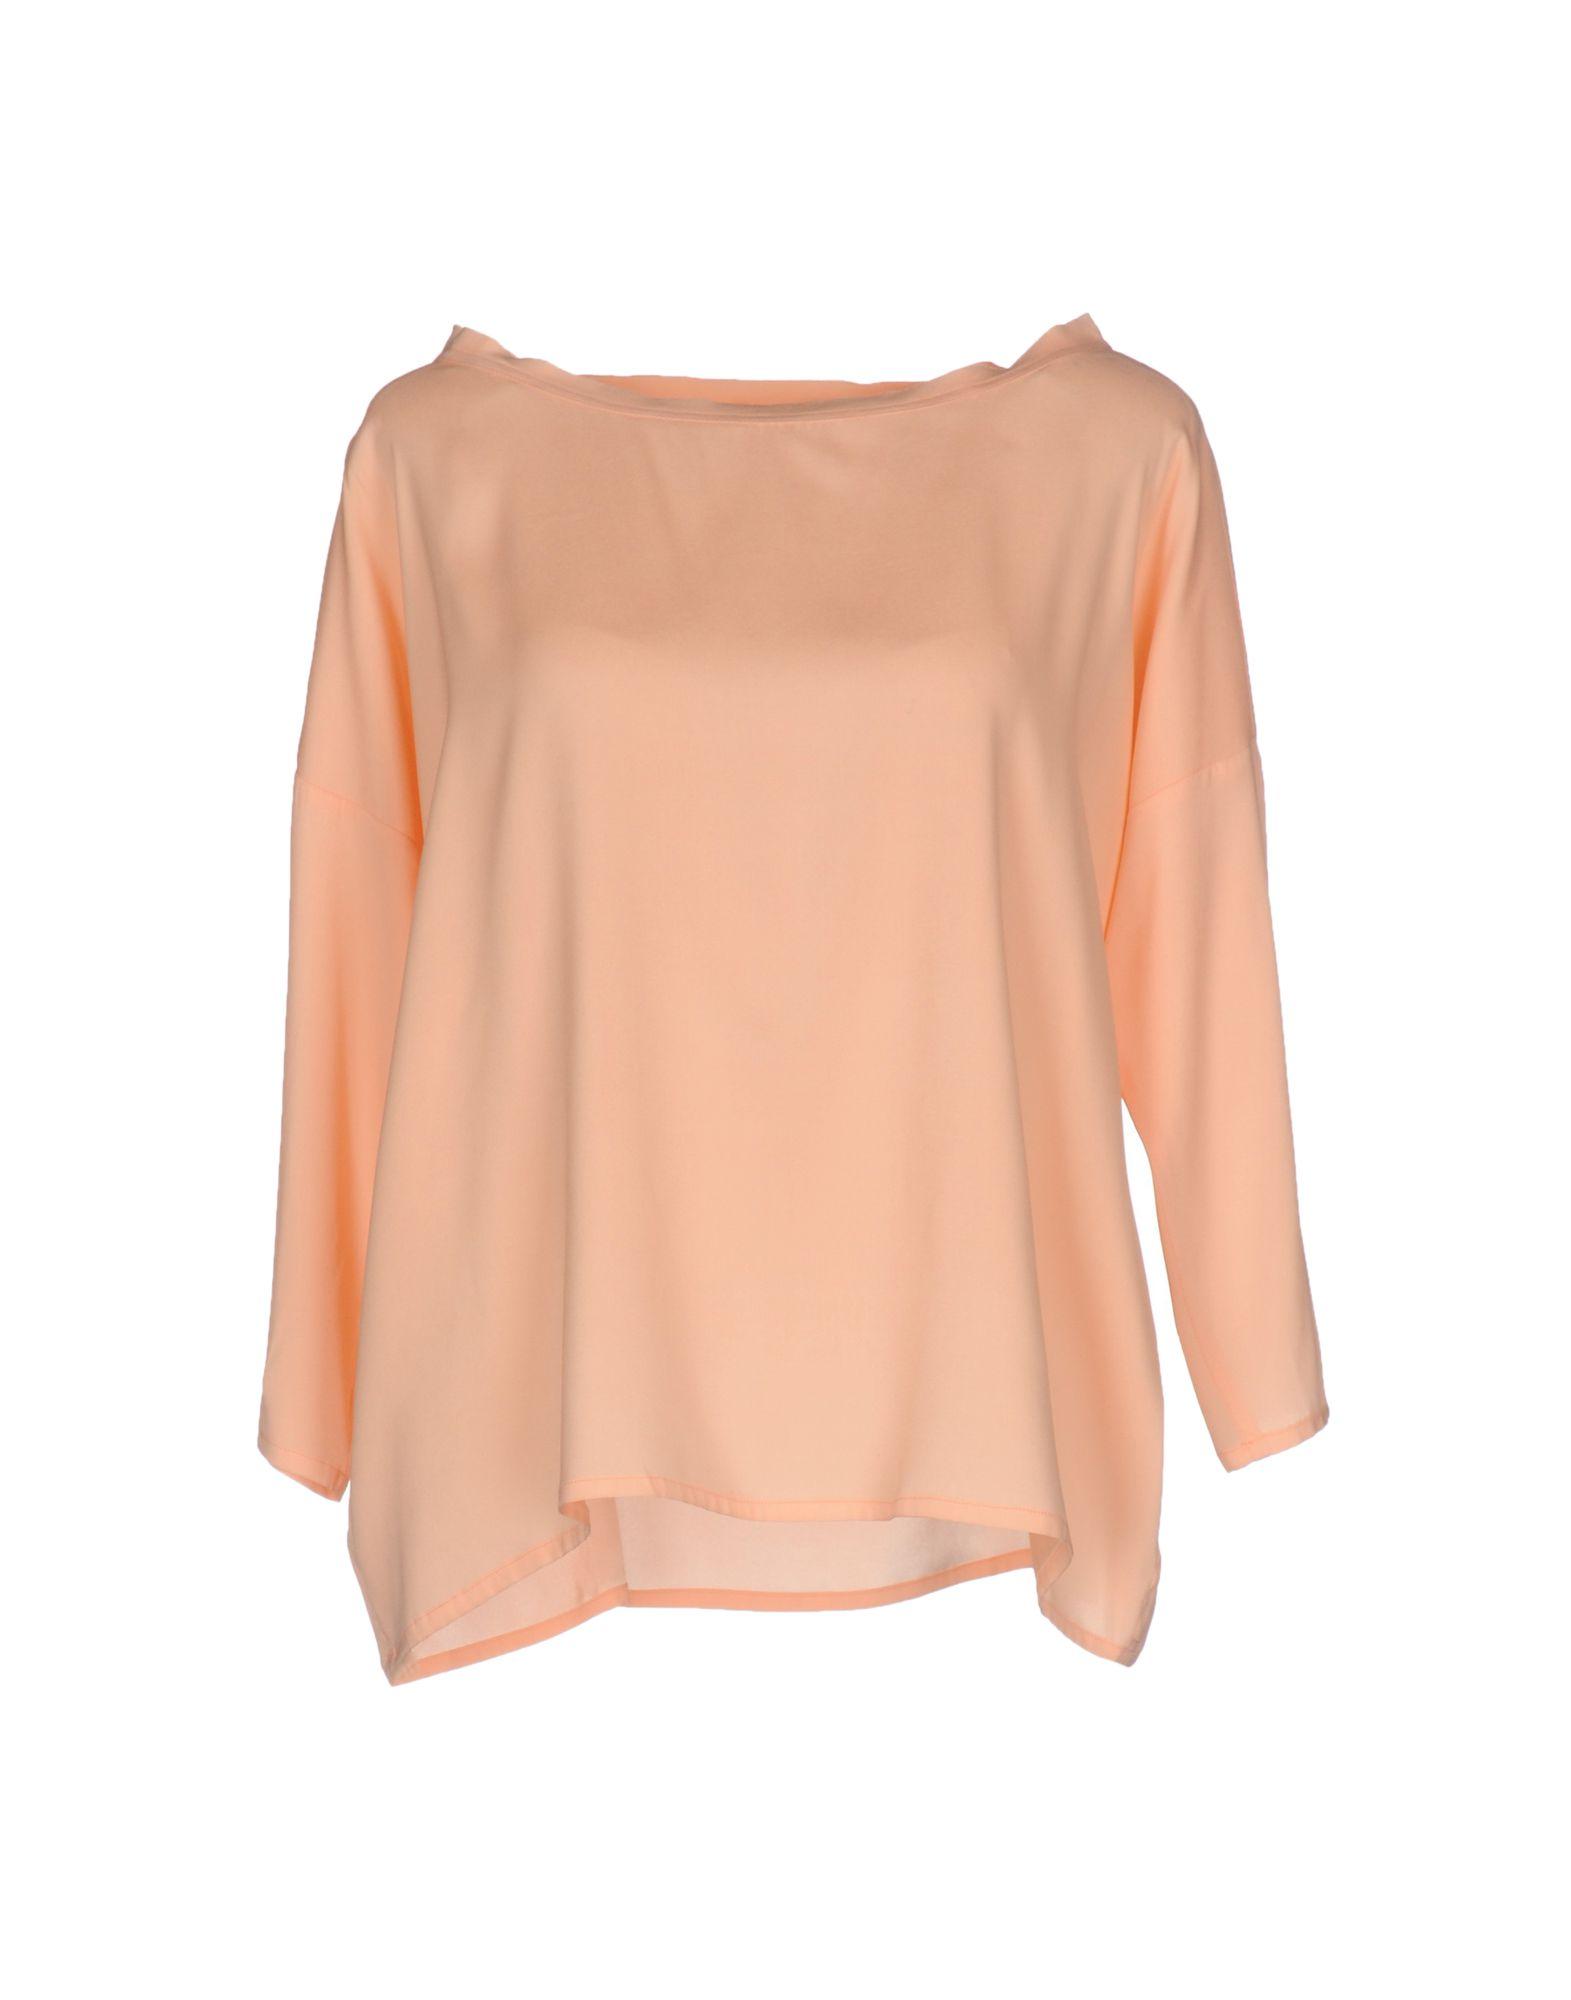 AM Блузка i am блузка